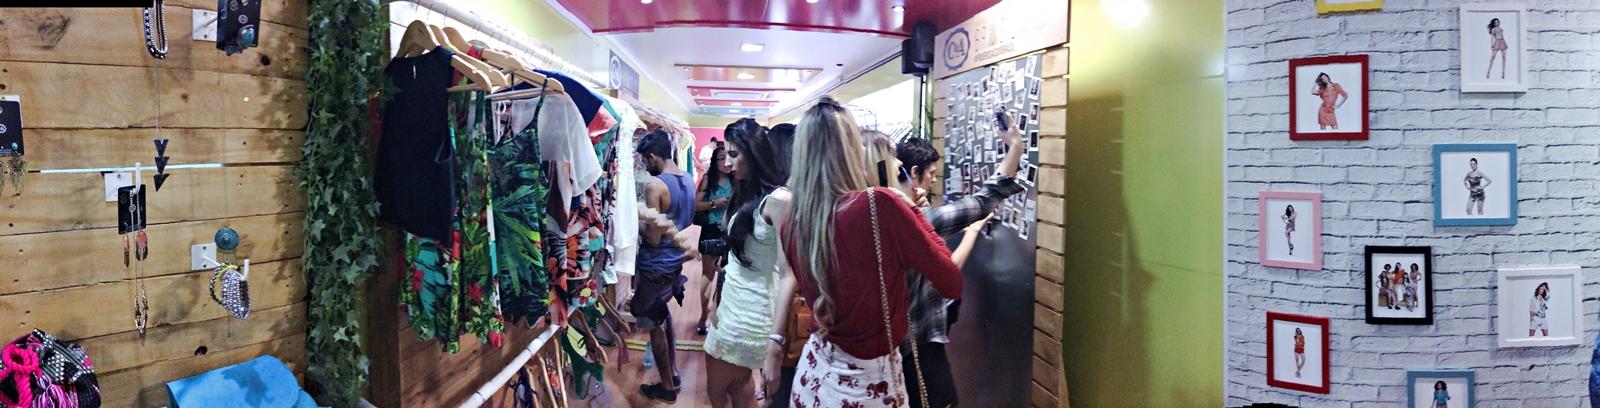 Fashion-Truck-C&A-Poderosas-do-Brasil-Goiânia